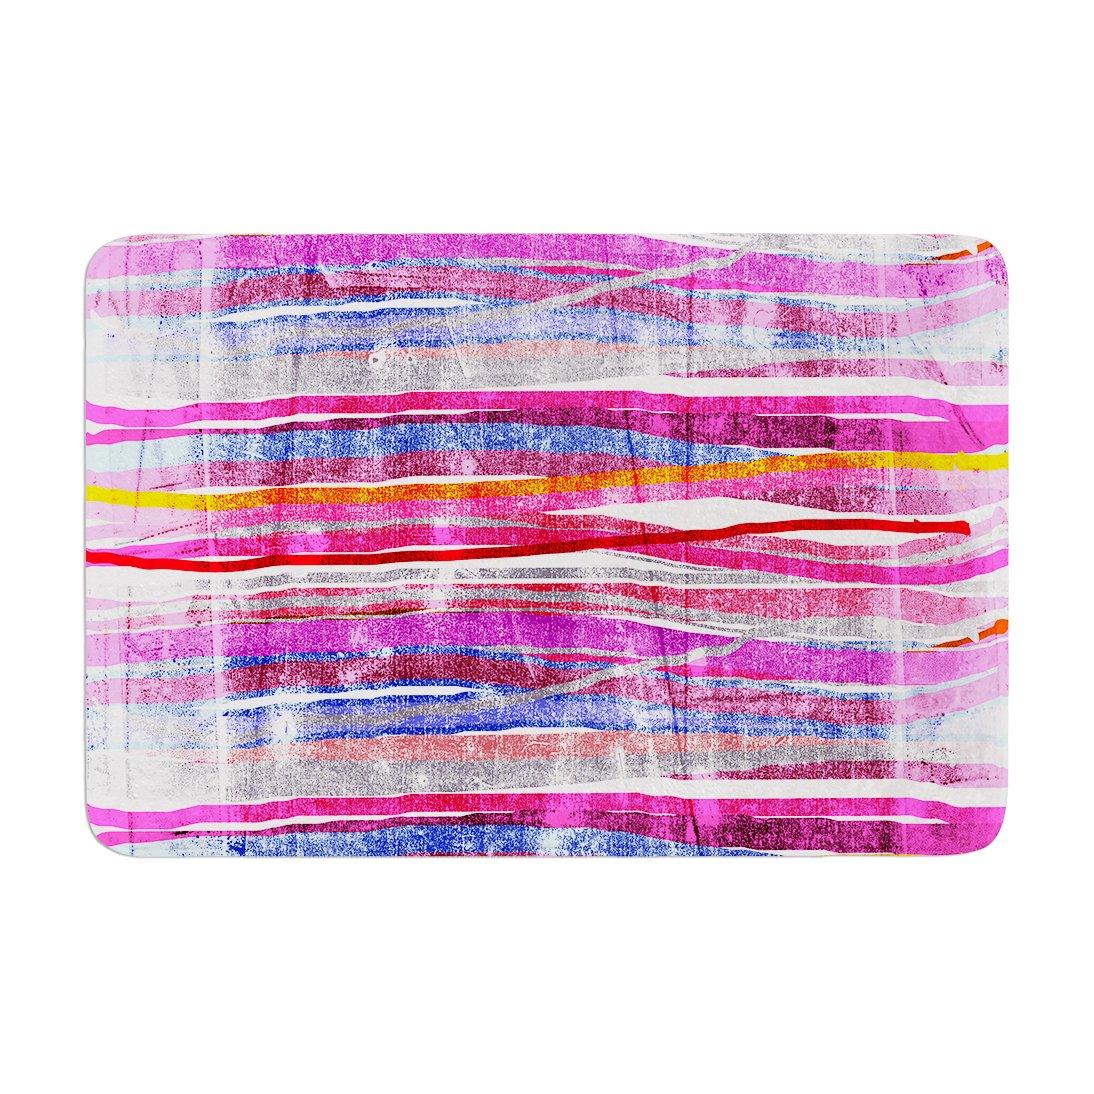 Kess InHouse Frederic Levy-Hadida Fancy Stripes Purple Memory Foam Bath Mat 17 by 24